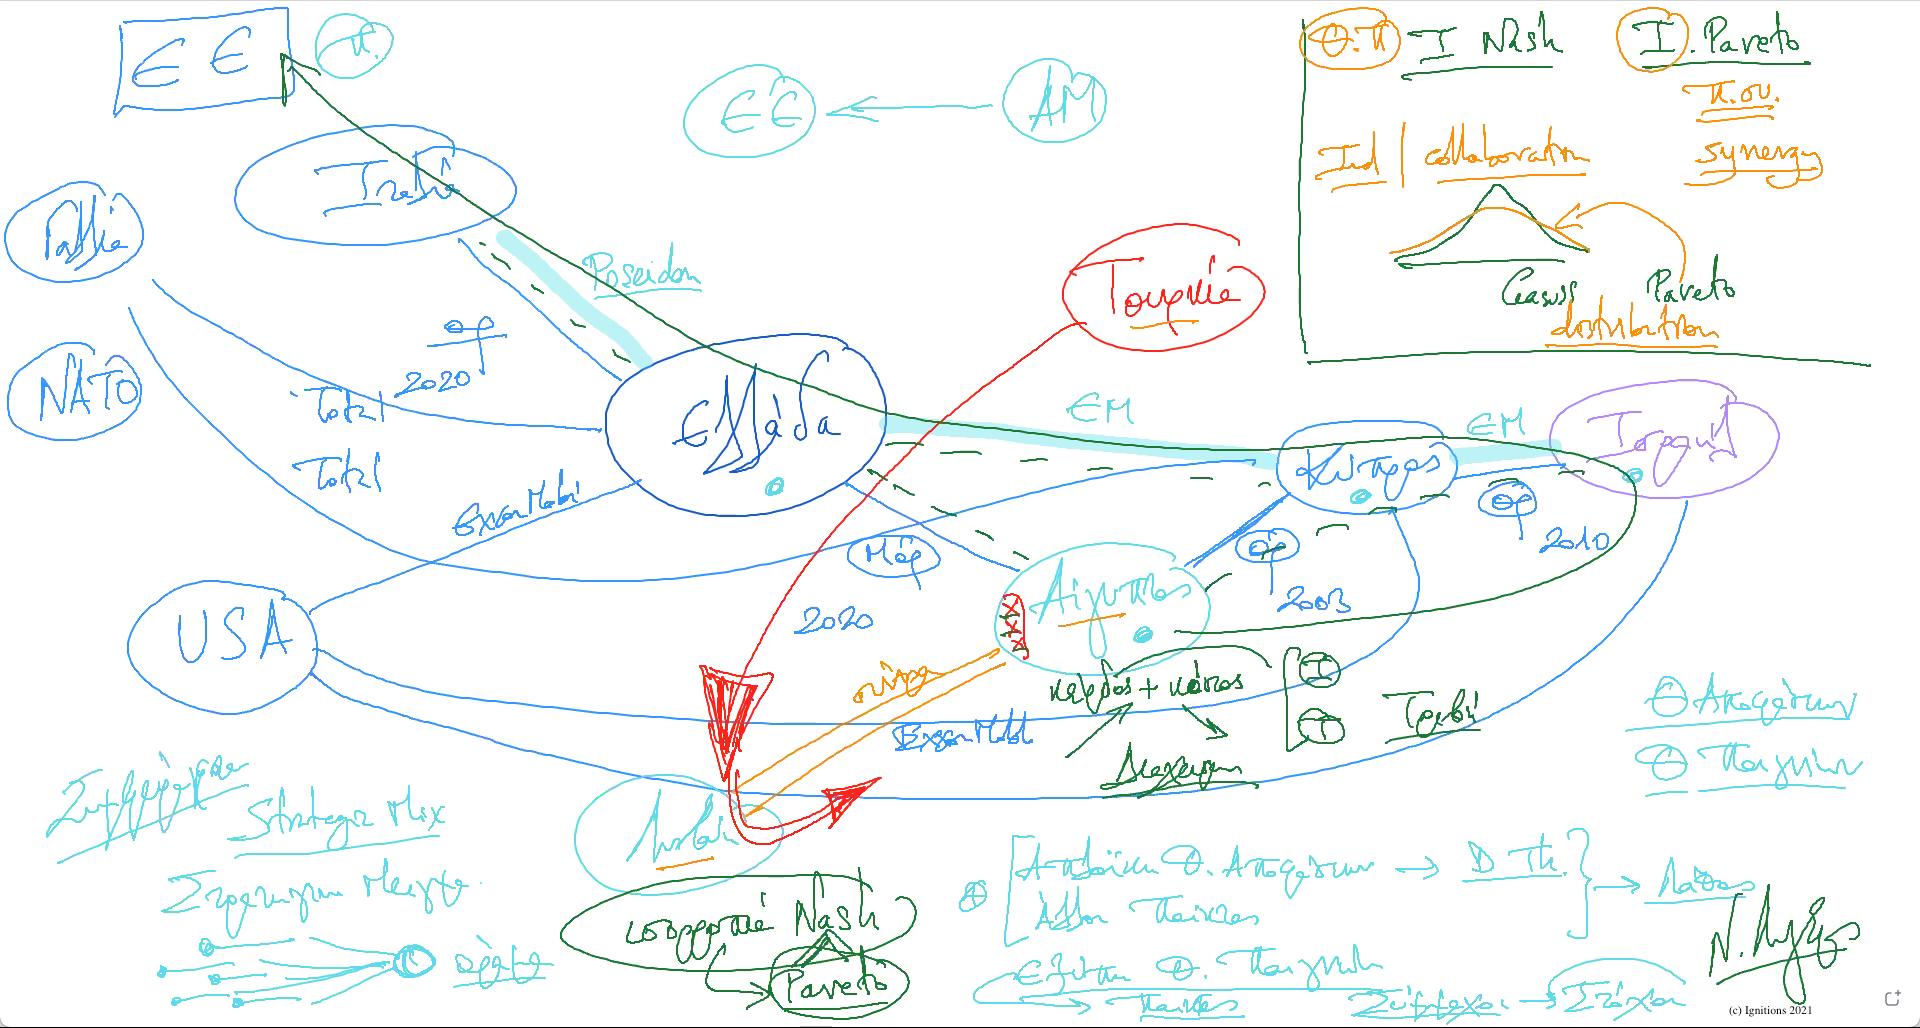 59671 - e-Μάθημα: Εφαρμοσμένη θεωρία παιγνίων στην Ανατολική Μεσόγειο. (Dessin)